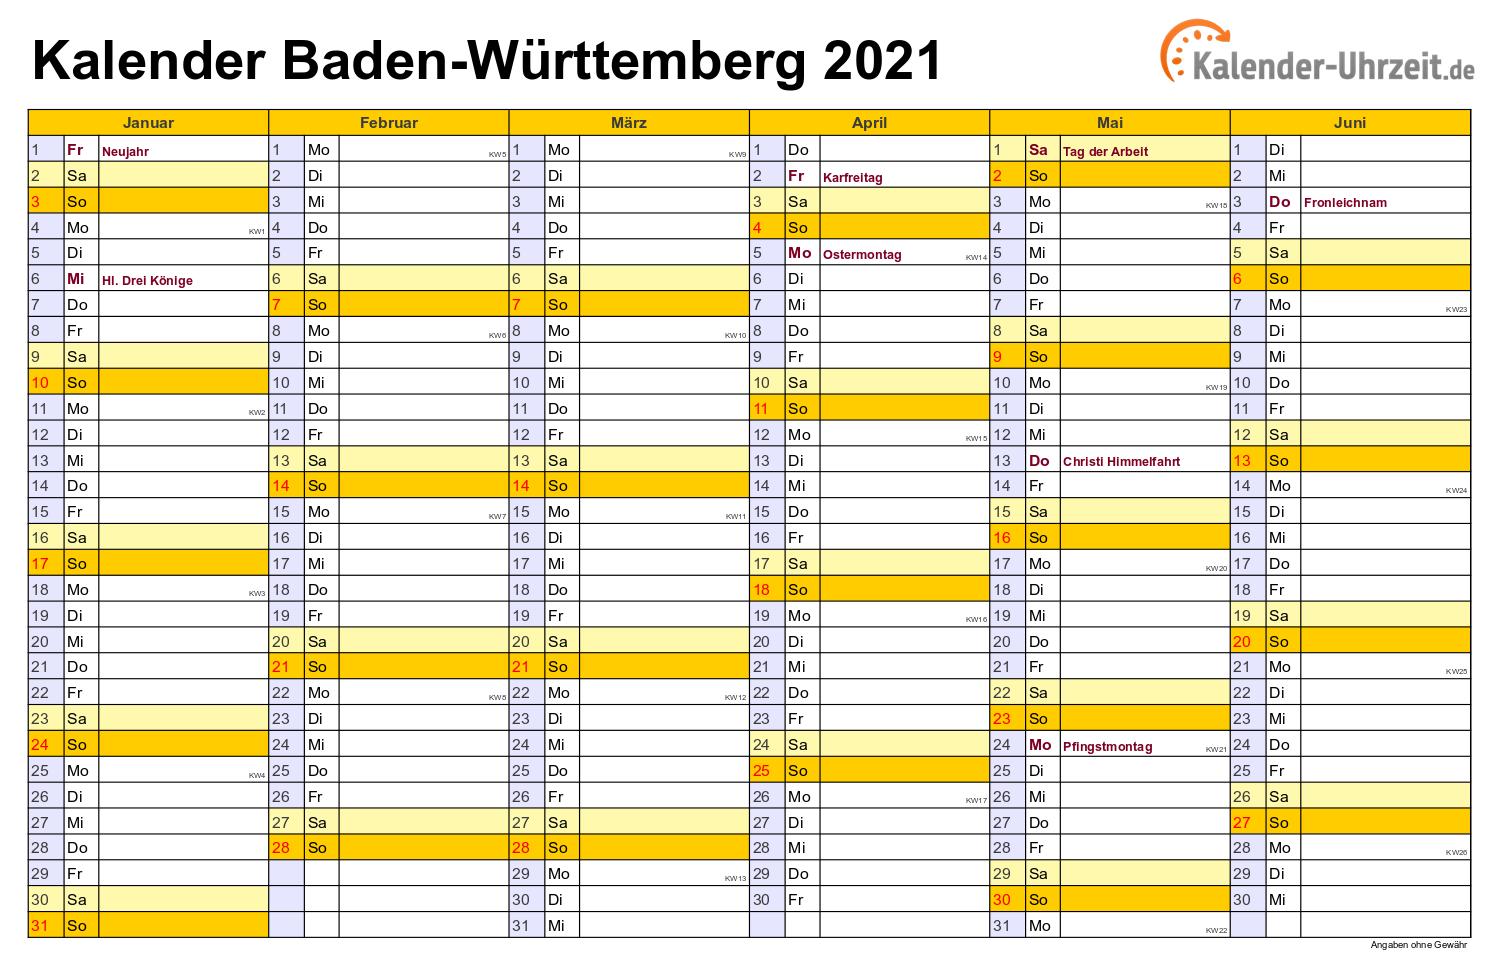 Feiertage 2021 Bw - Ferien Bw 2021/22 : Kalender 2021 ...